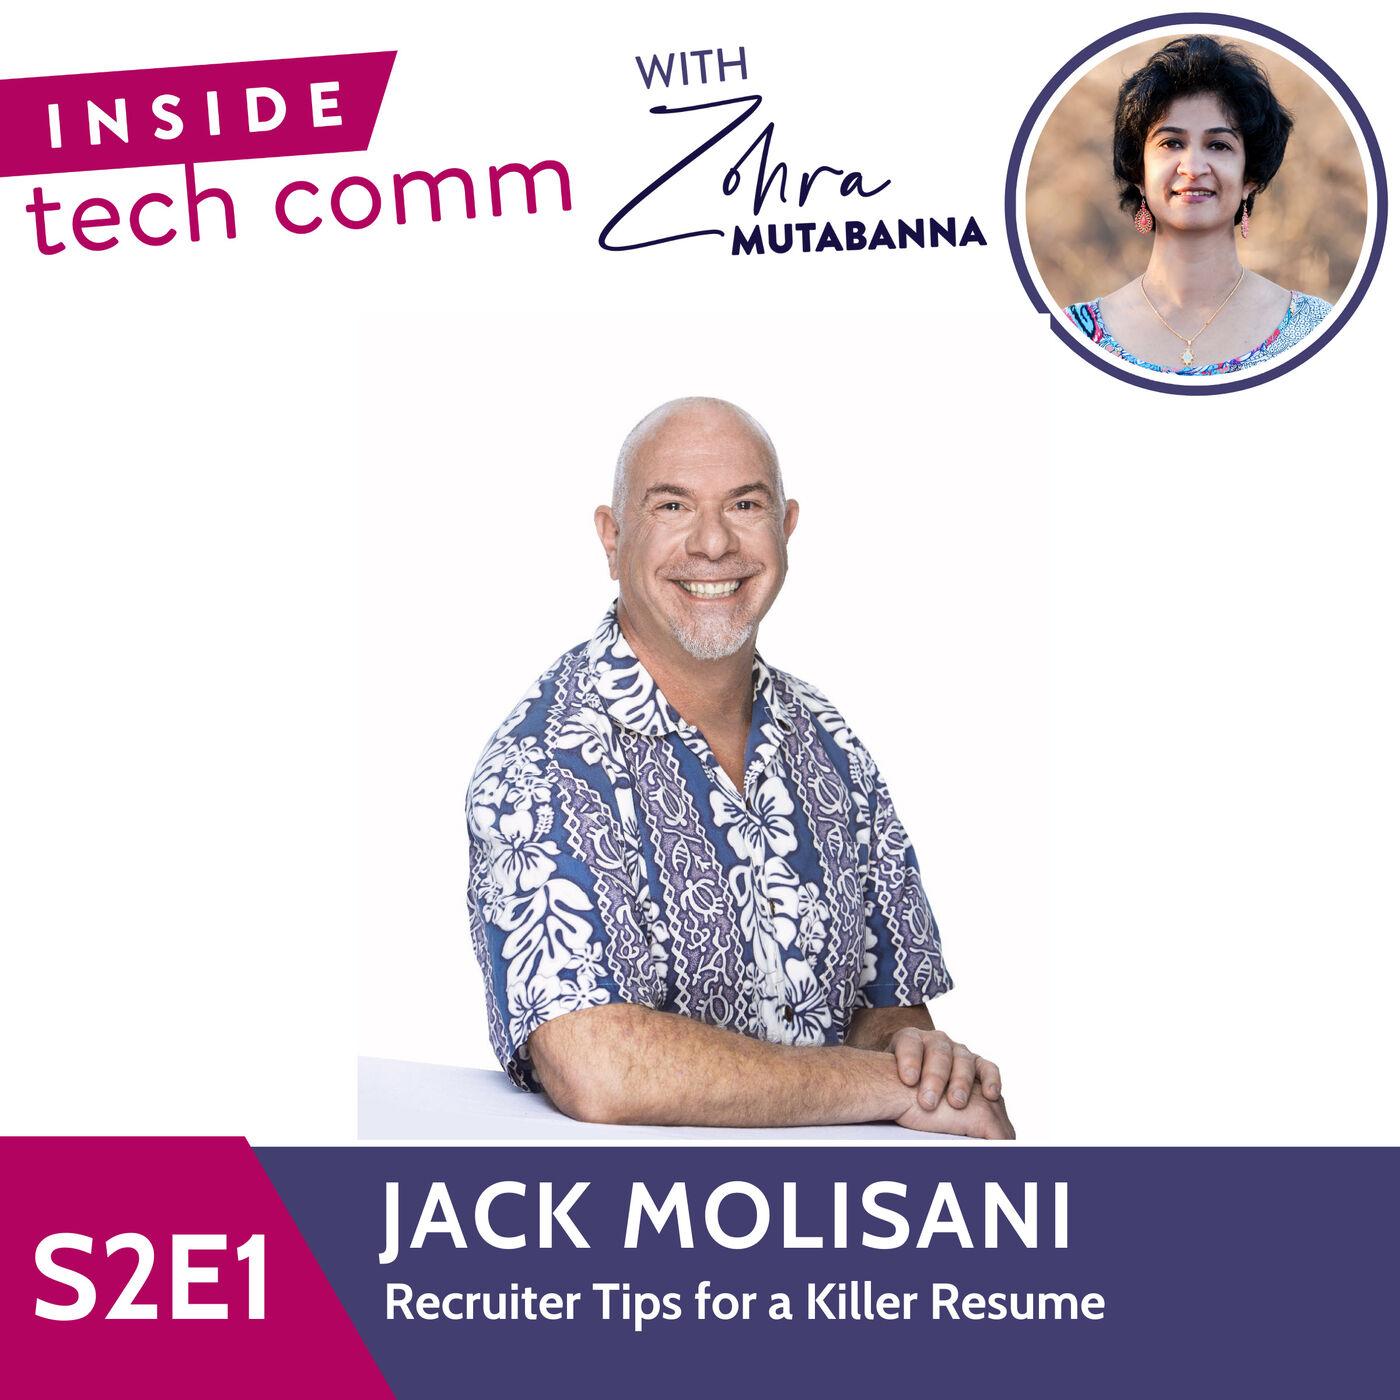 S2E1 Recruiter Tips for a Killer Resume with Jack Molisani